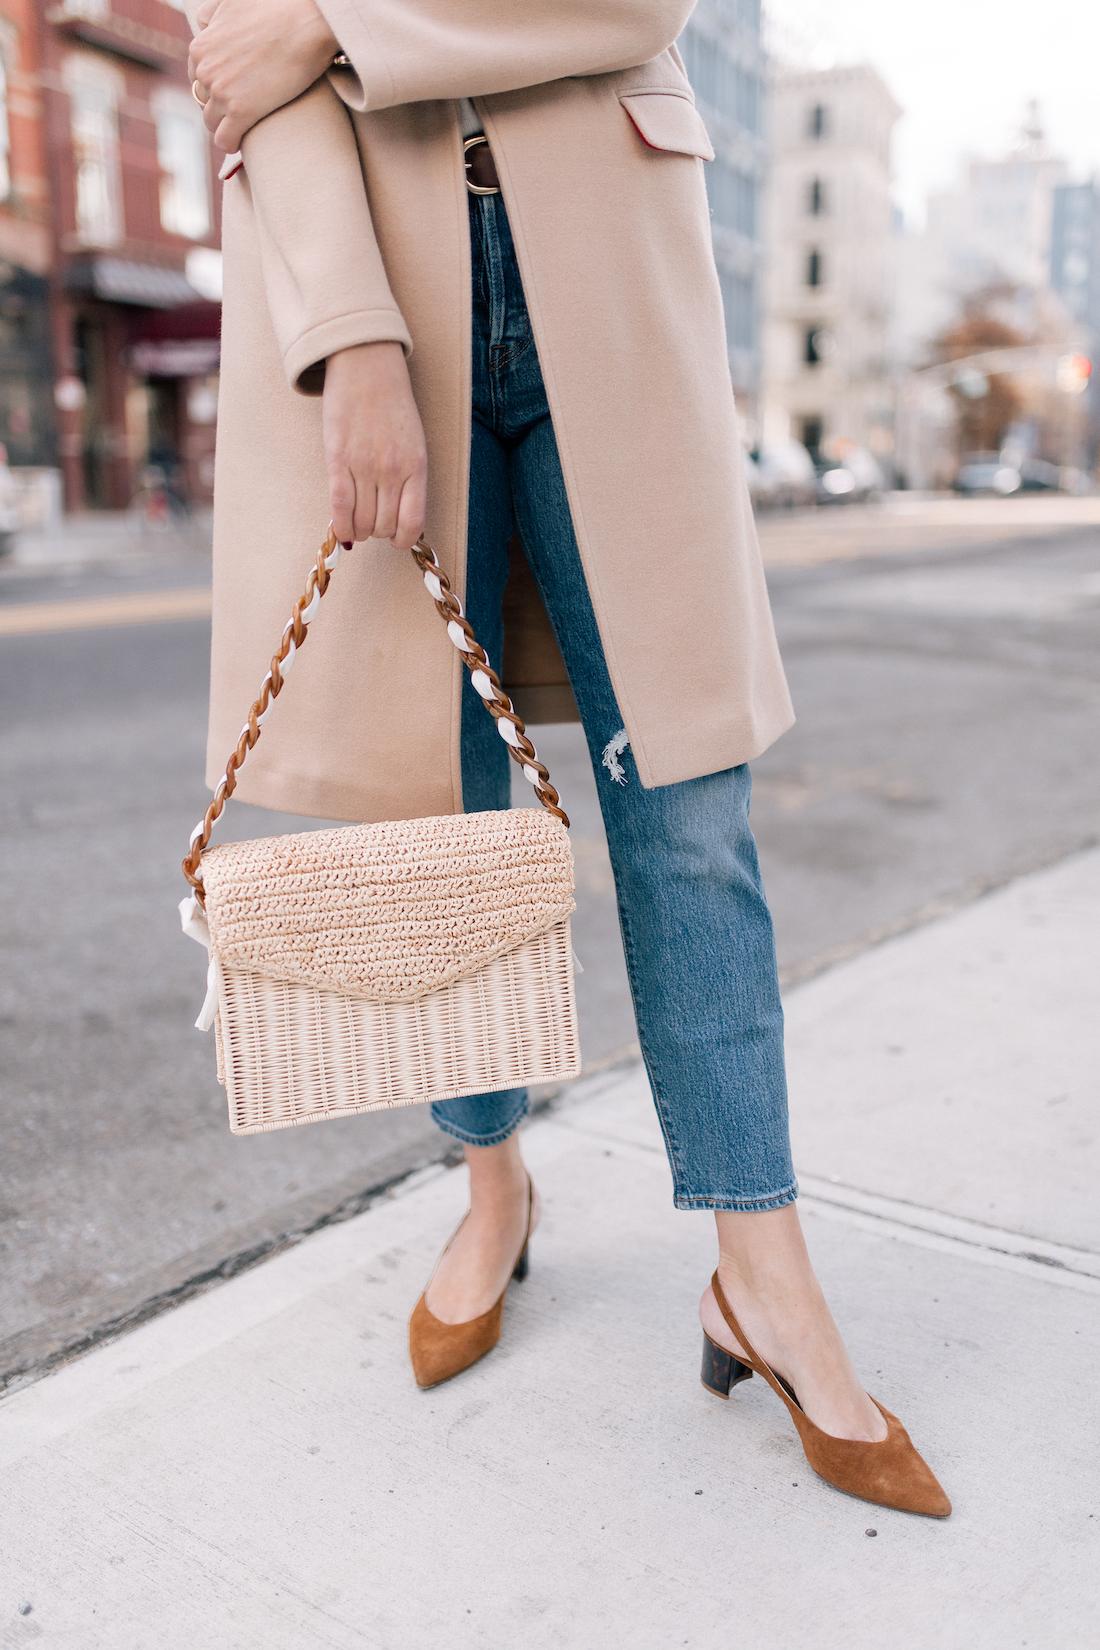 Levi's Jeans // Pamela Munson Bag (c/o) // Sarah Flint Heels // J.Crew Belt